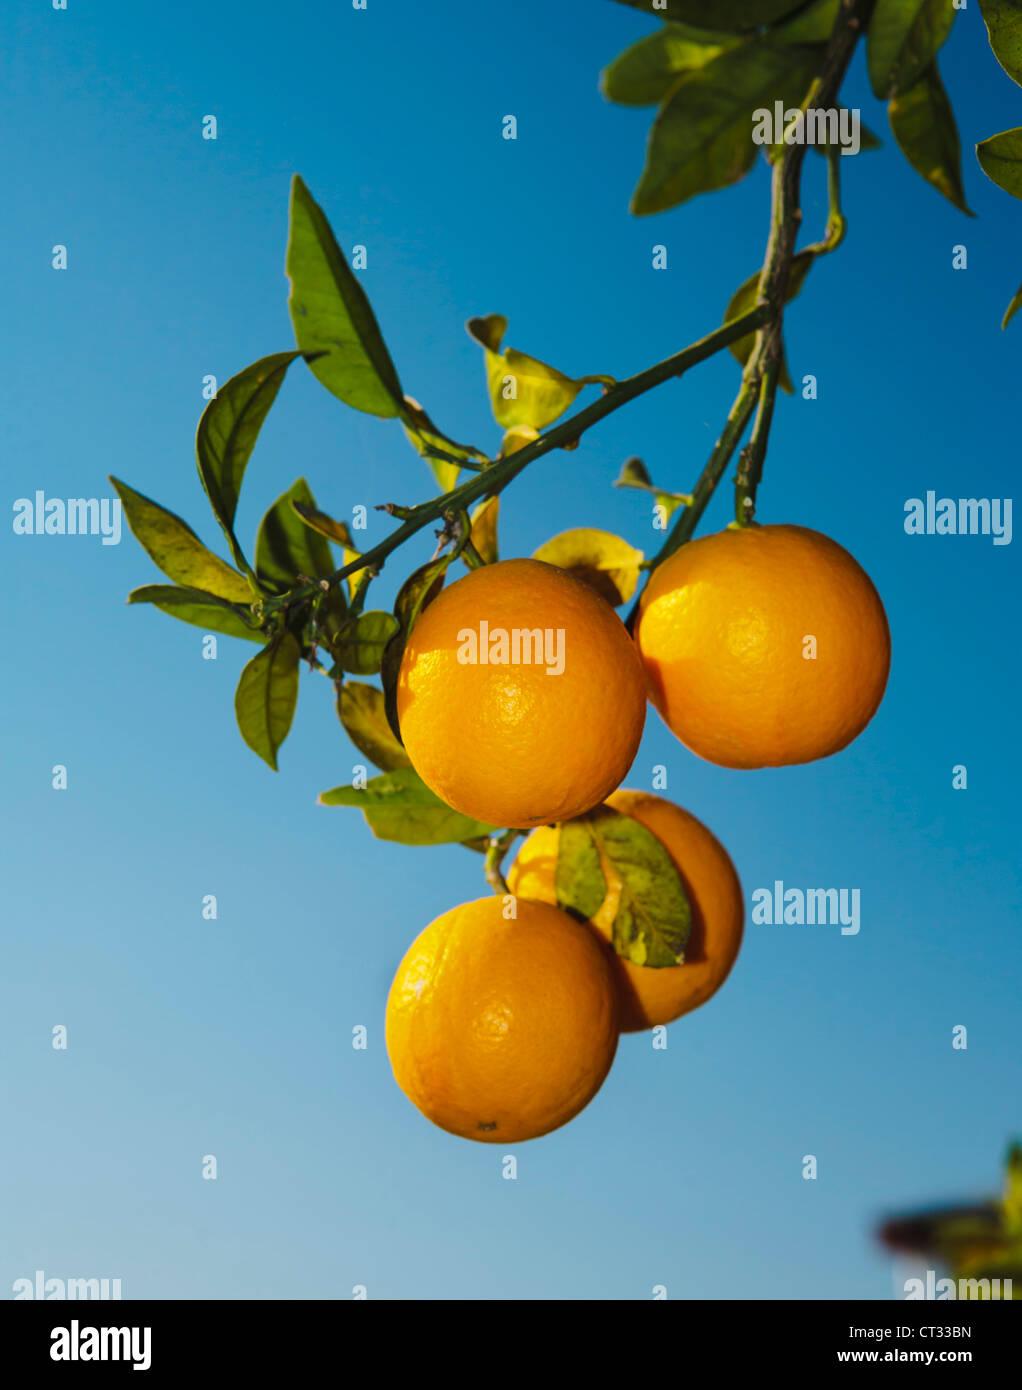 Oranges on branch, Himachal Pradesh, India - Stock Image